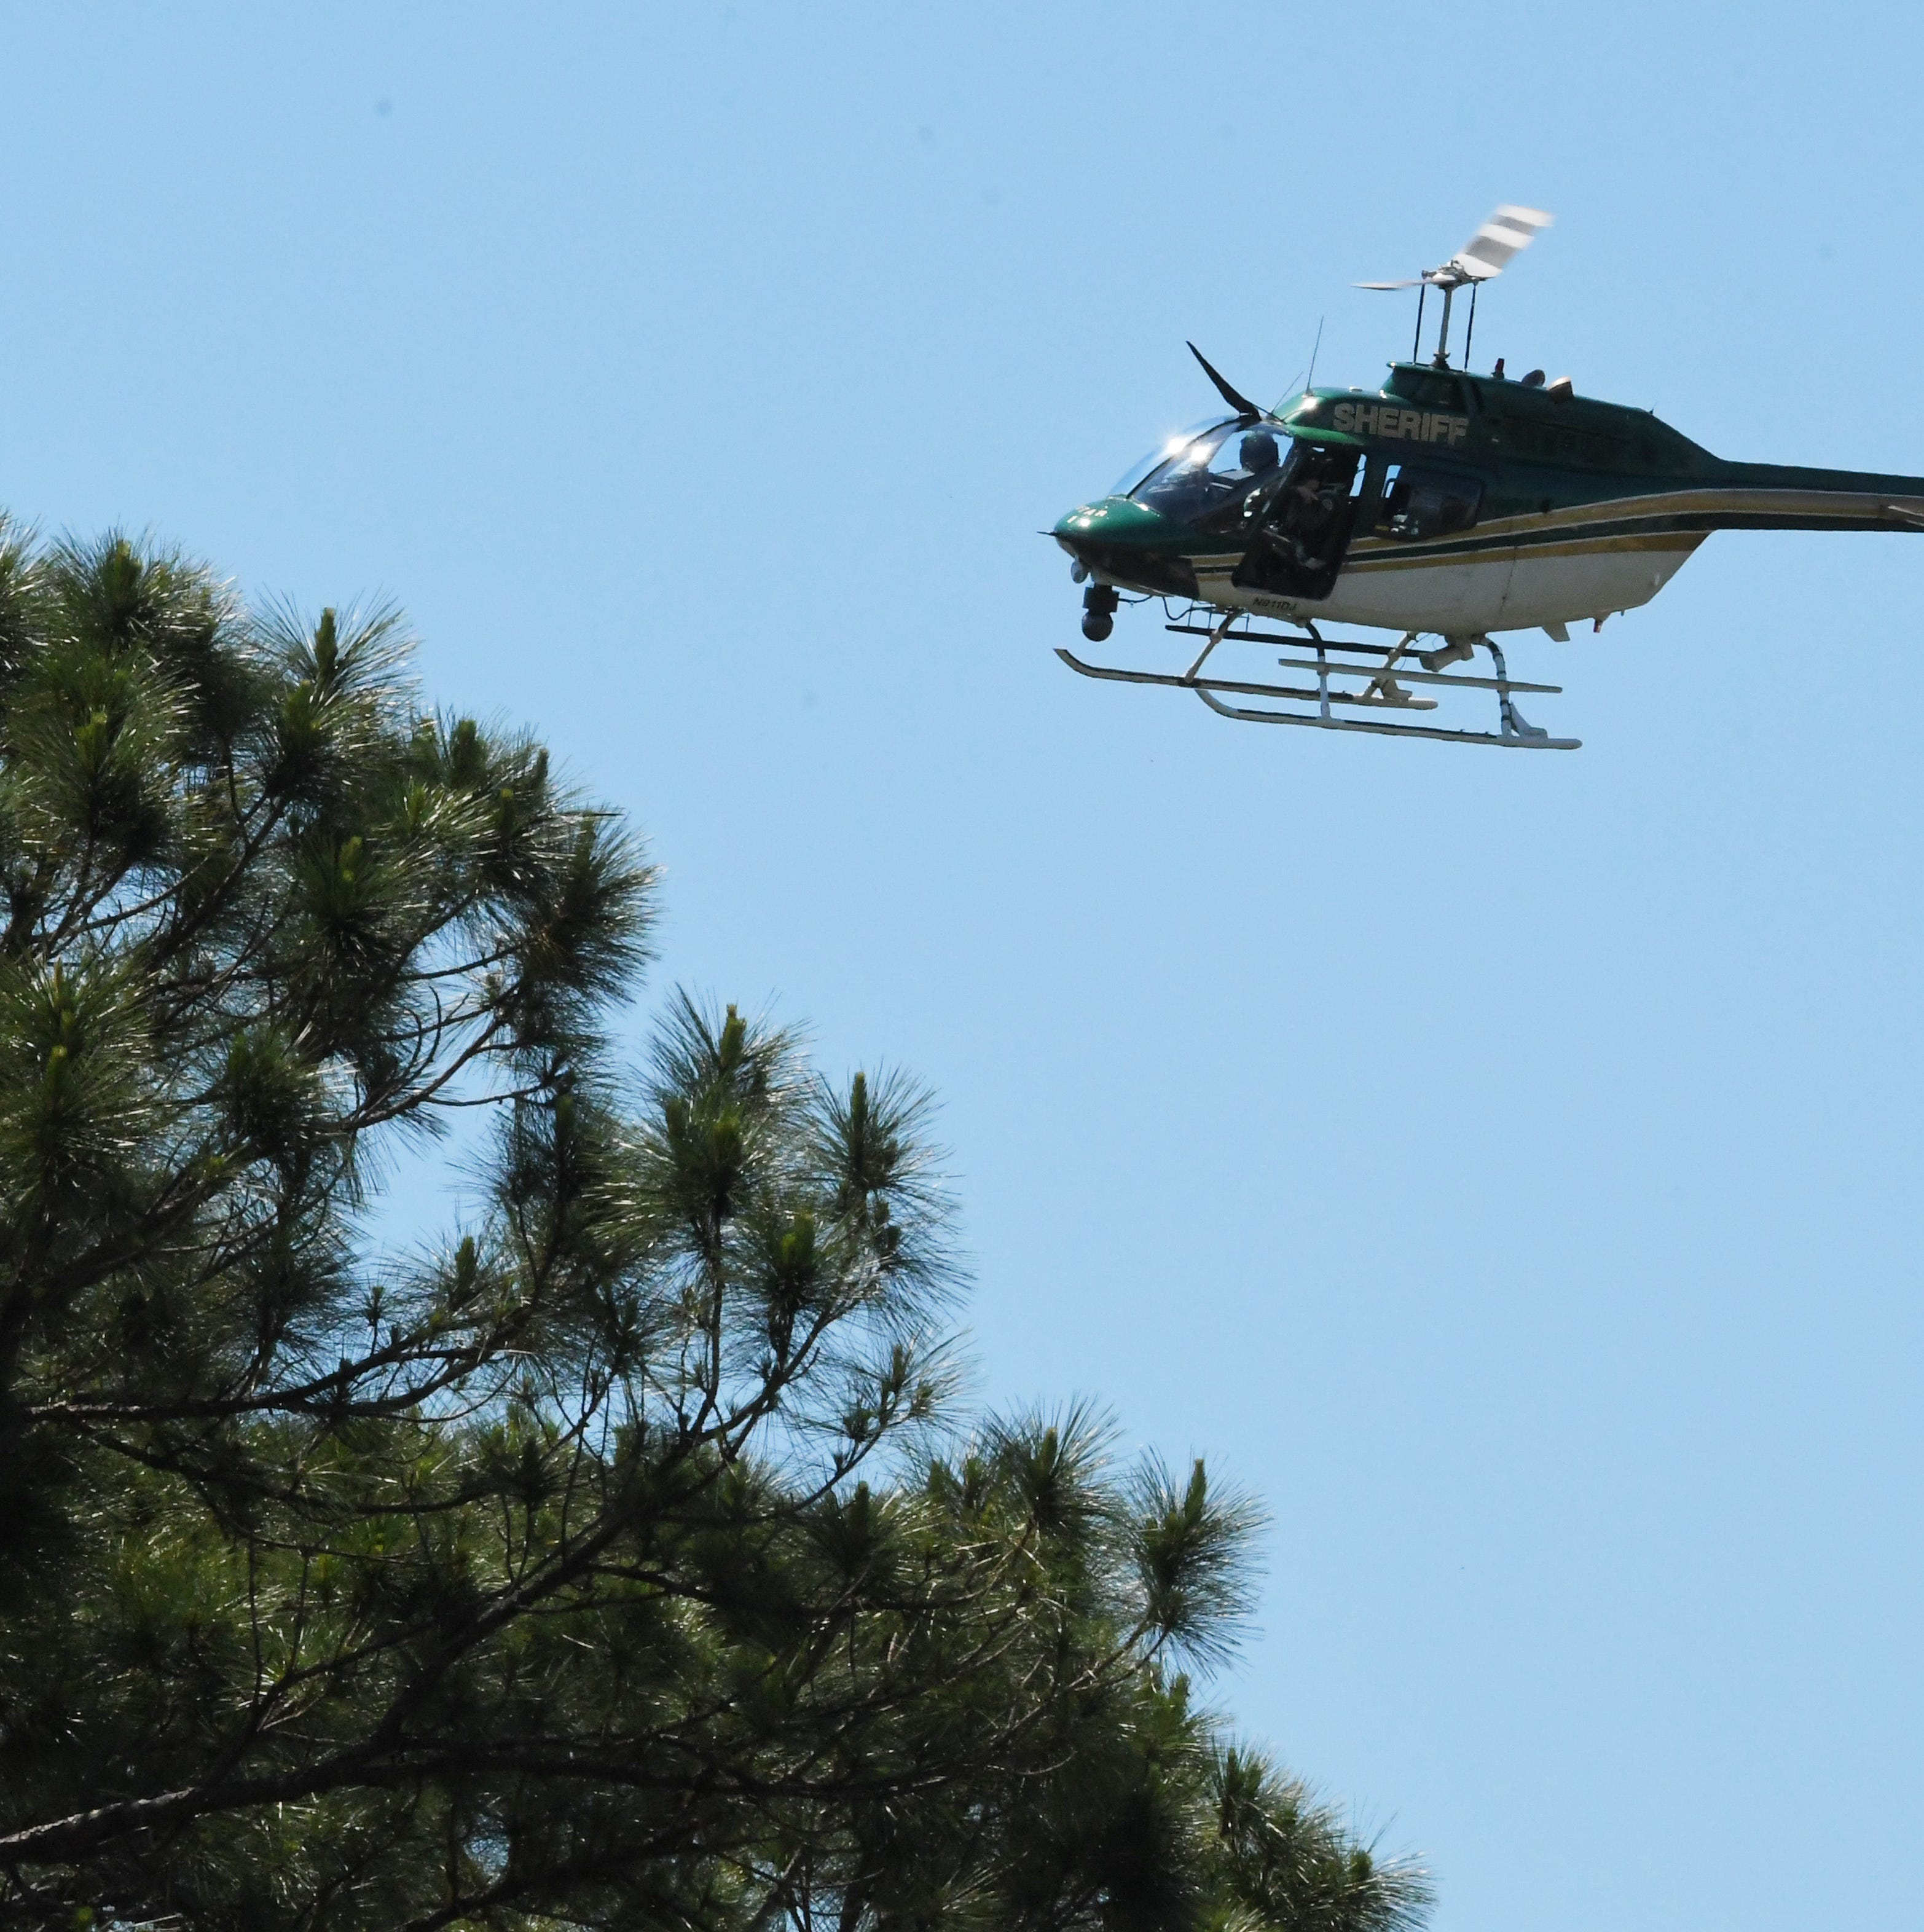 Airplane down near Sebastian, pilot, passenger survive hard landing